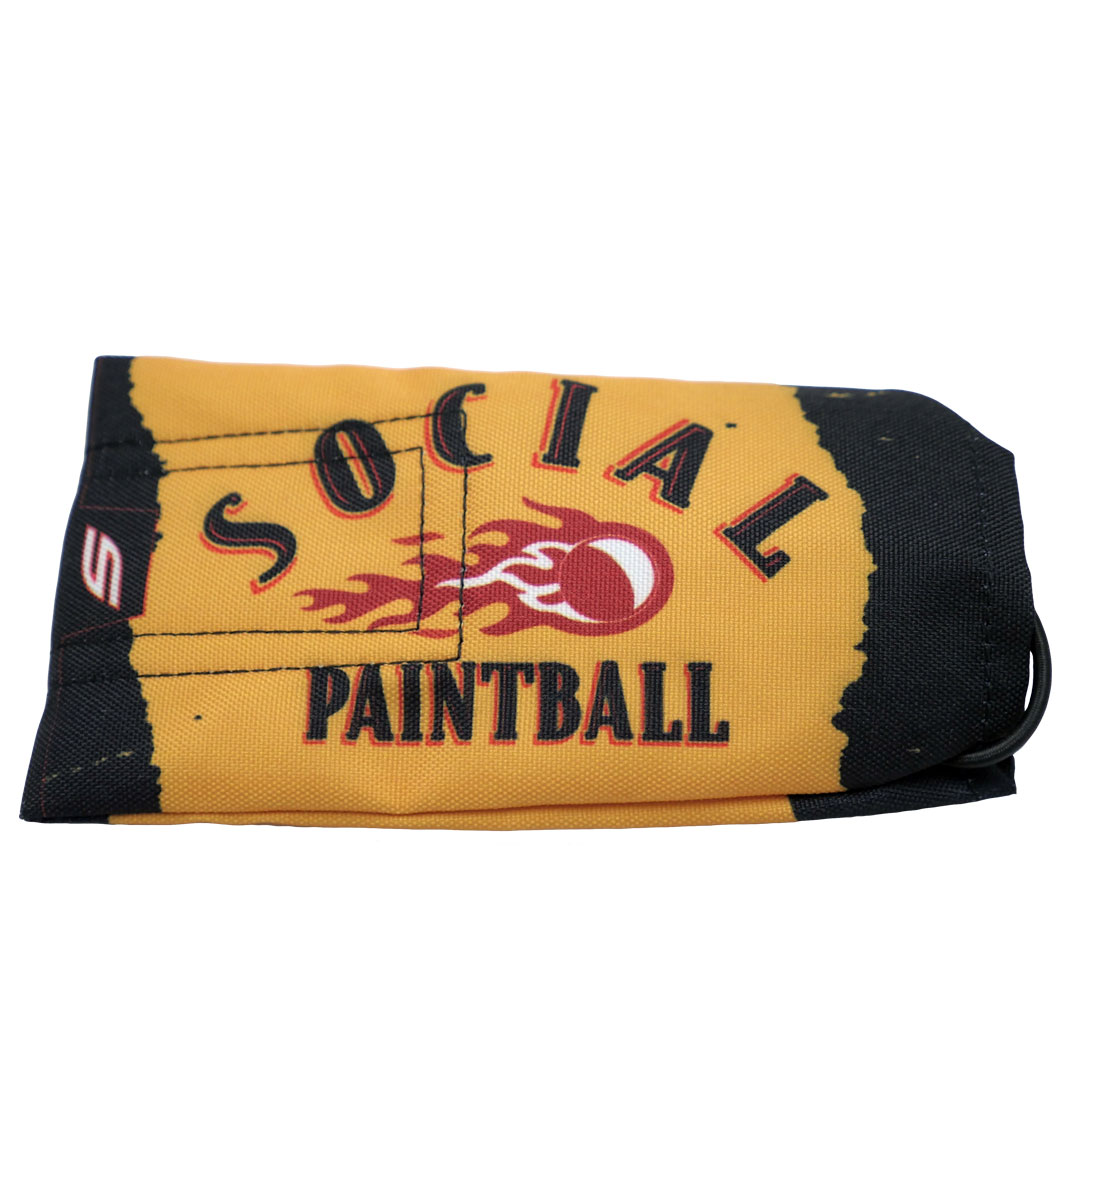 barrel cover social fireball social paintball. Black Bedroom Furniture Sets. Home Design Ideas